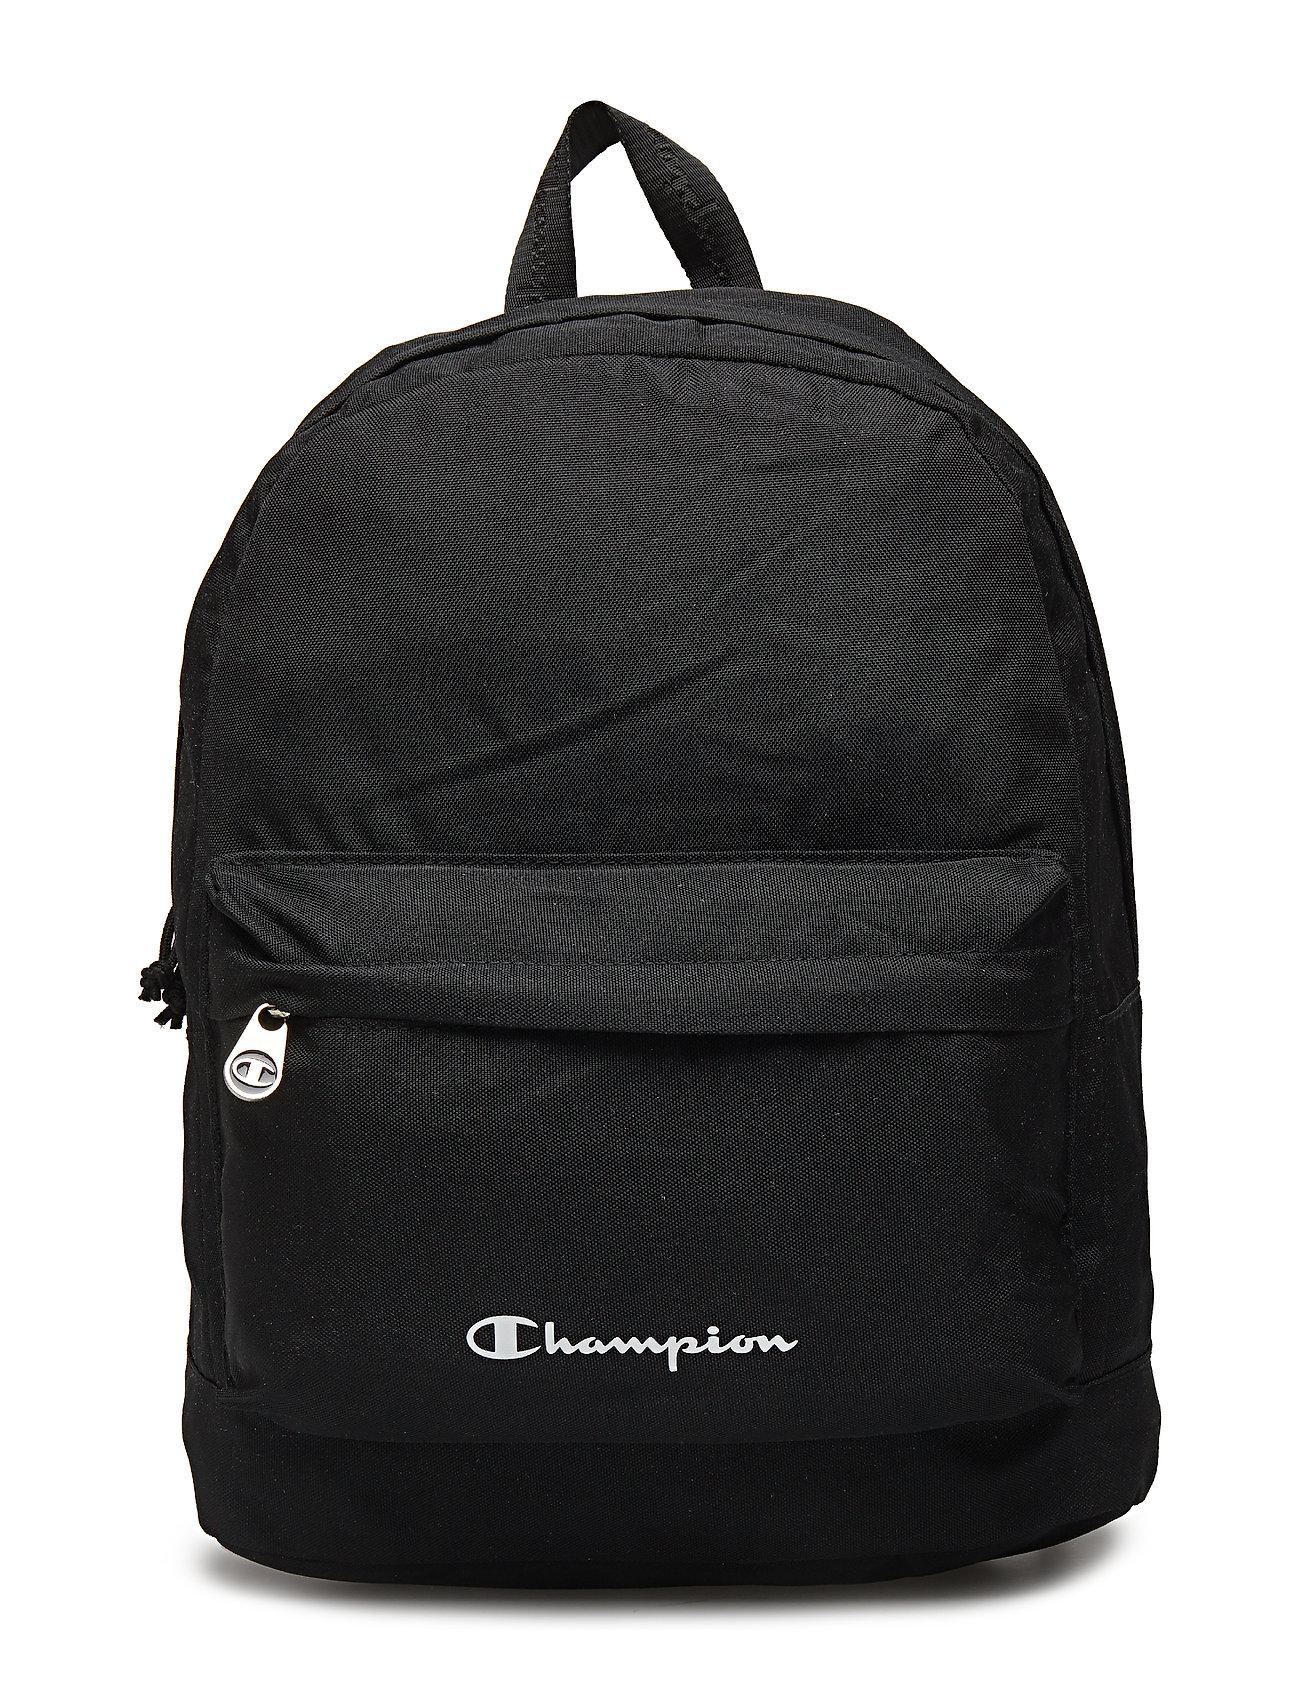 Champion Backpack   Ryggsäckar